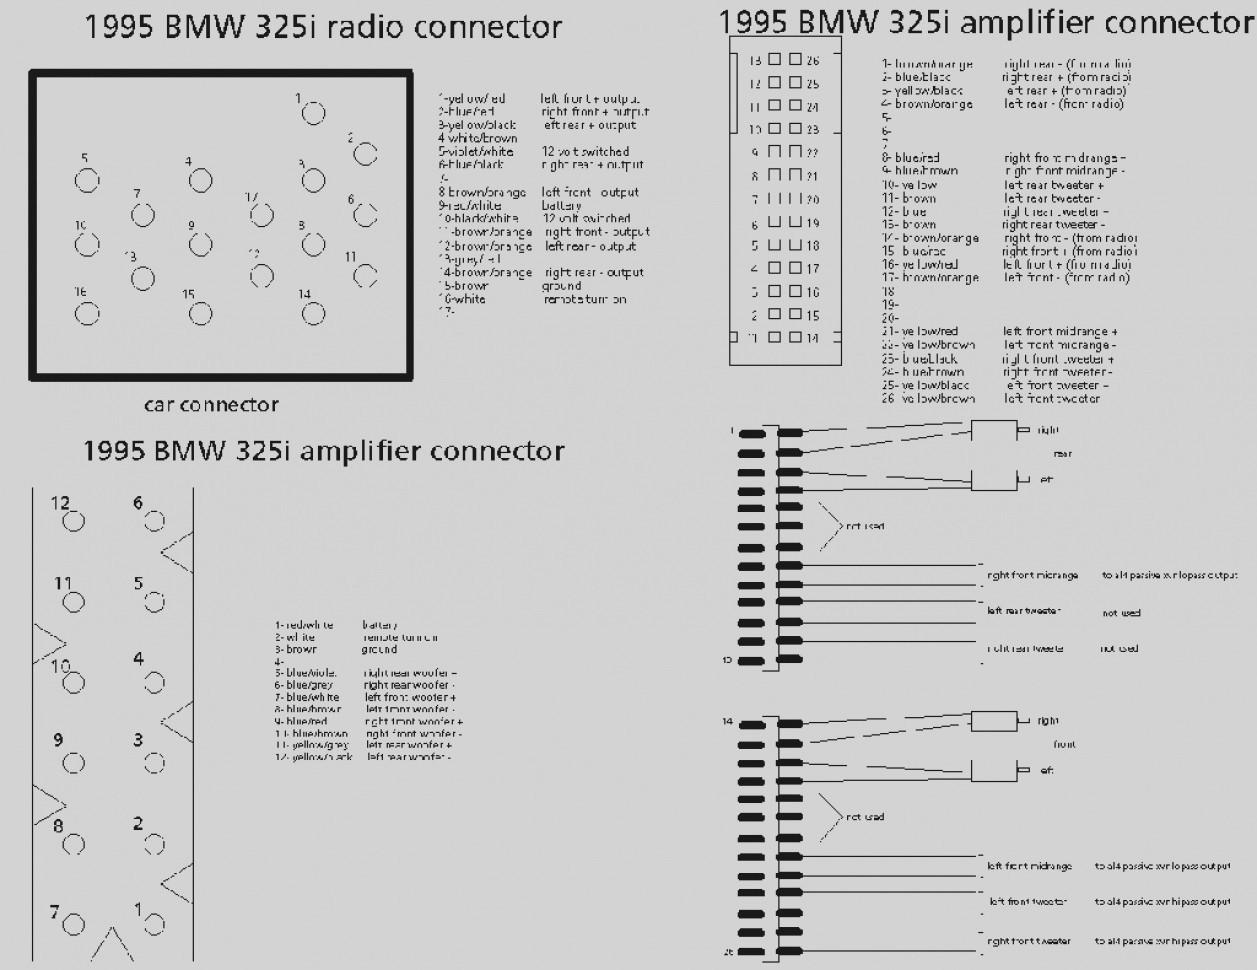 E39 Radio Wiring - General Wiring Diagrams181.ku.tarnopolski.de